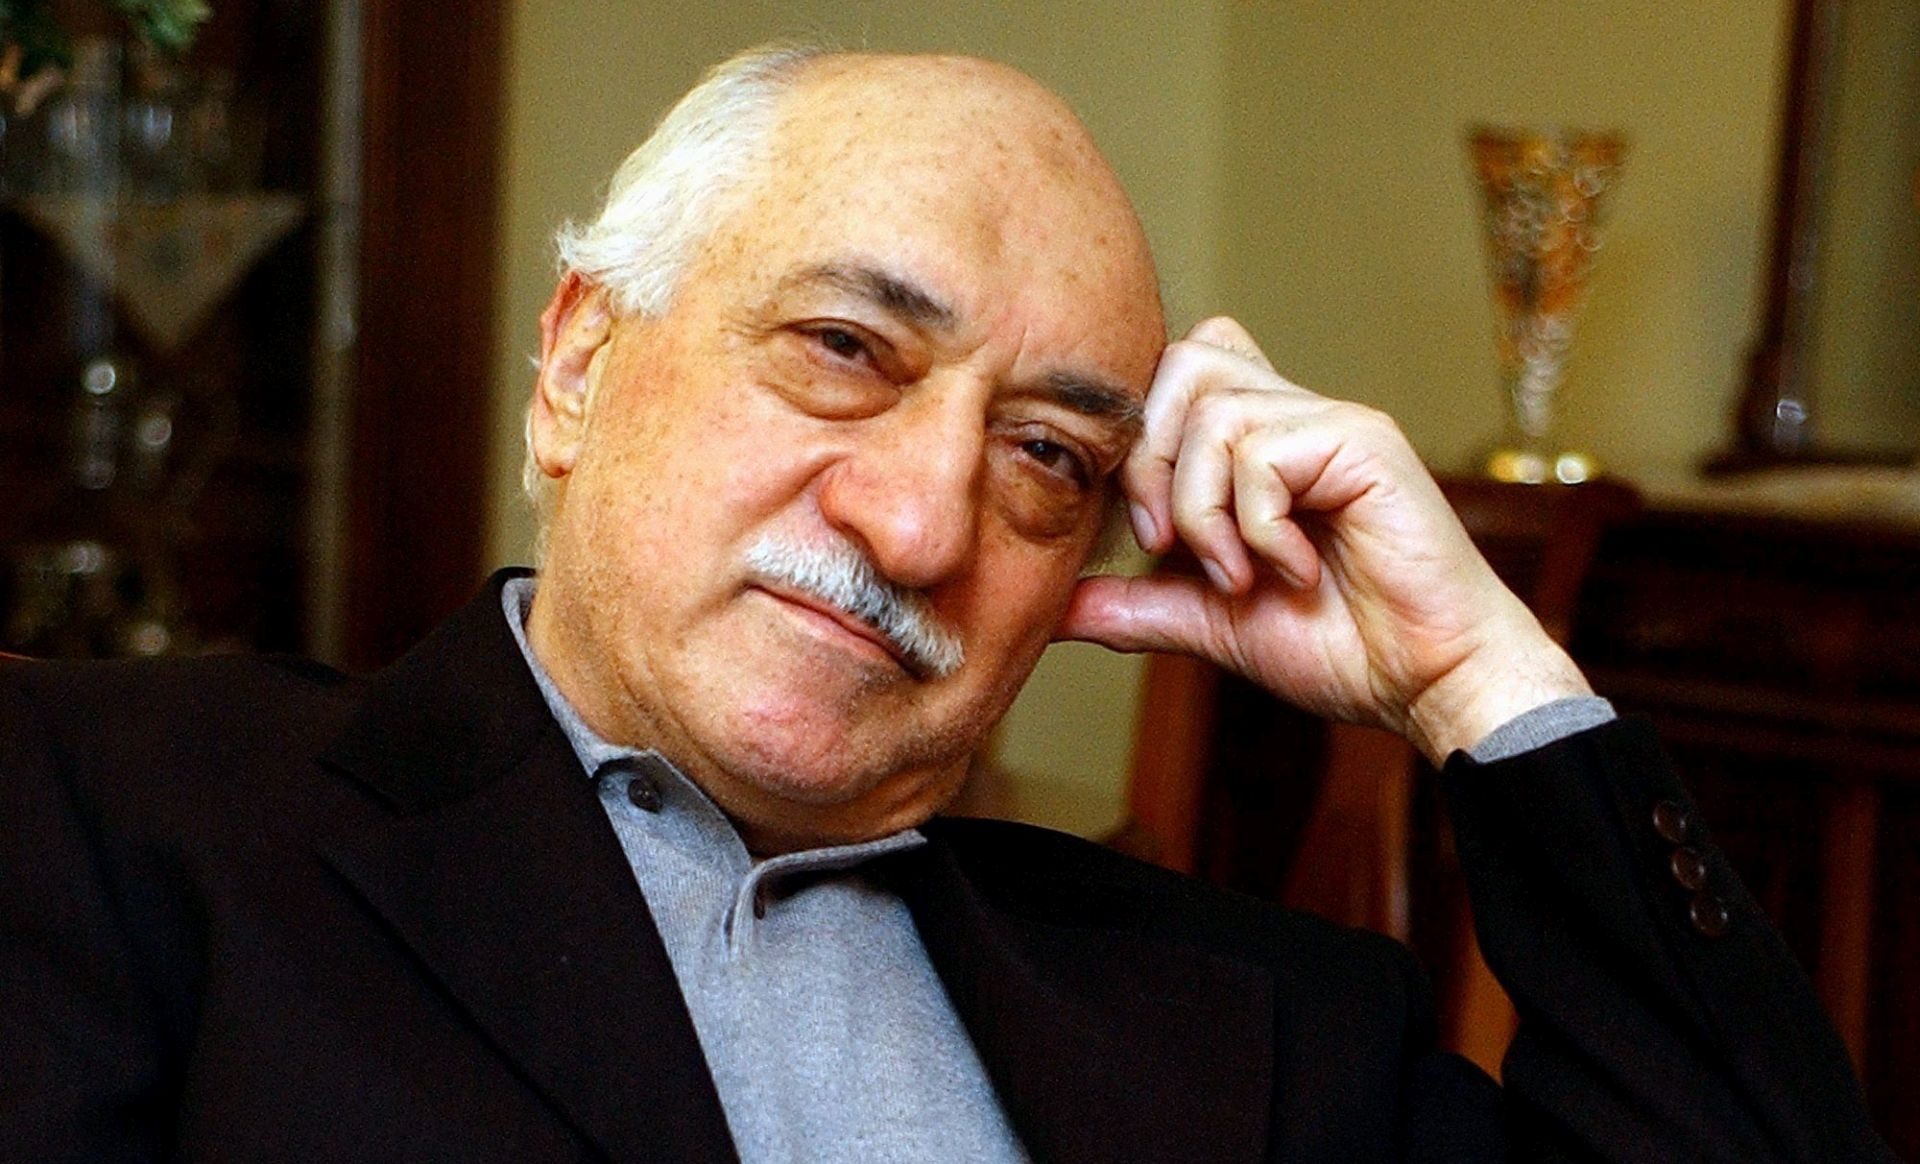 TURSKA Izdan uhidbeni nalog za Fetullahom Gulenom